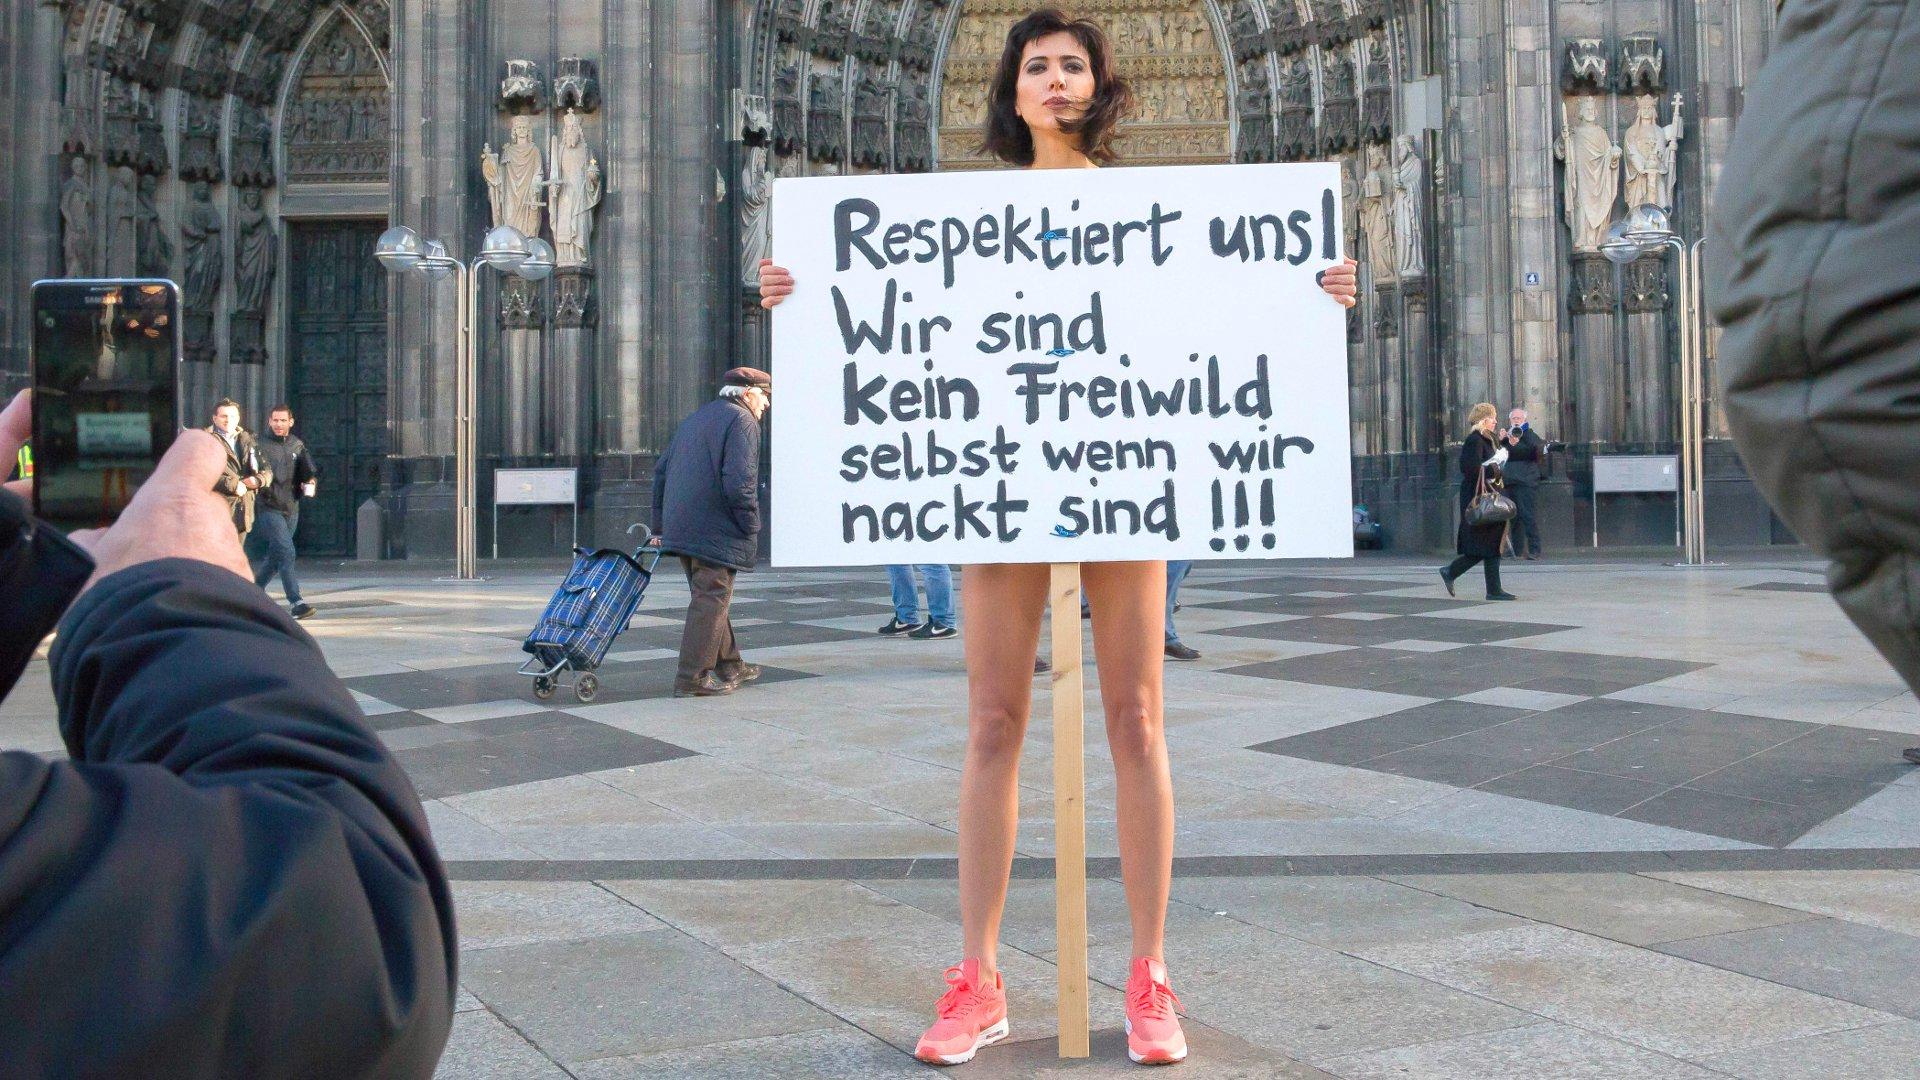 Nacktkünstlerin Milo Moiré protestiert nackt am Kölner Dom, Januar 2016.